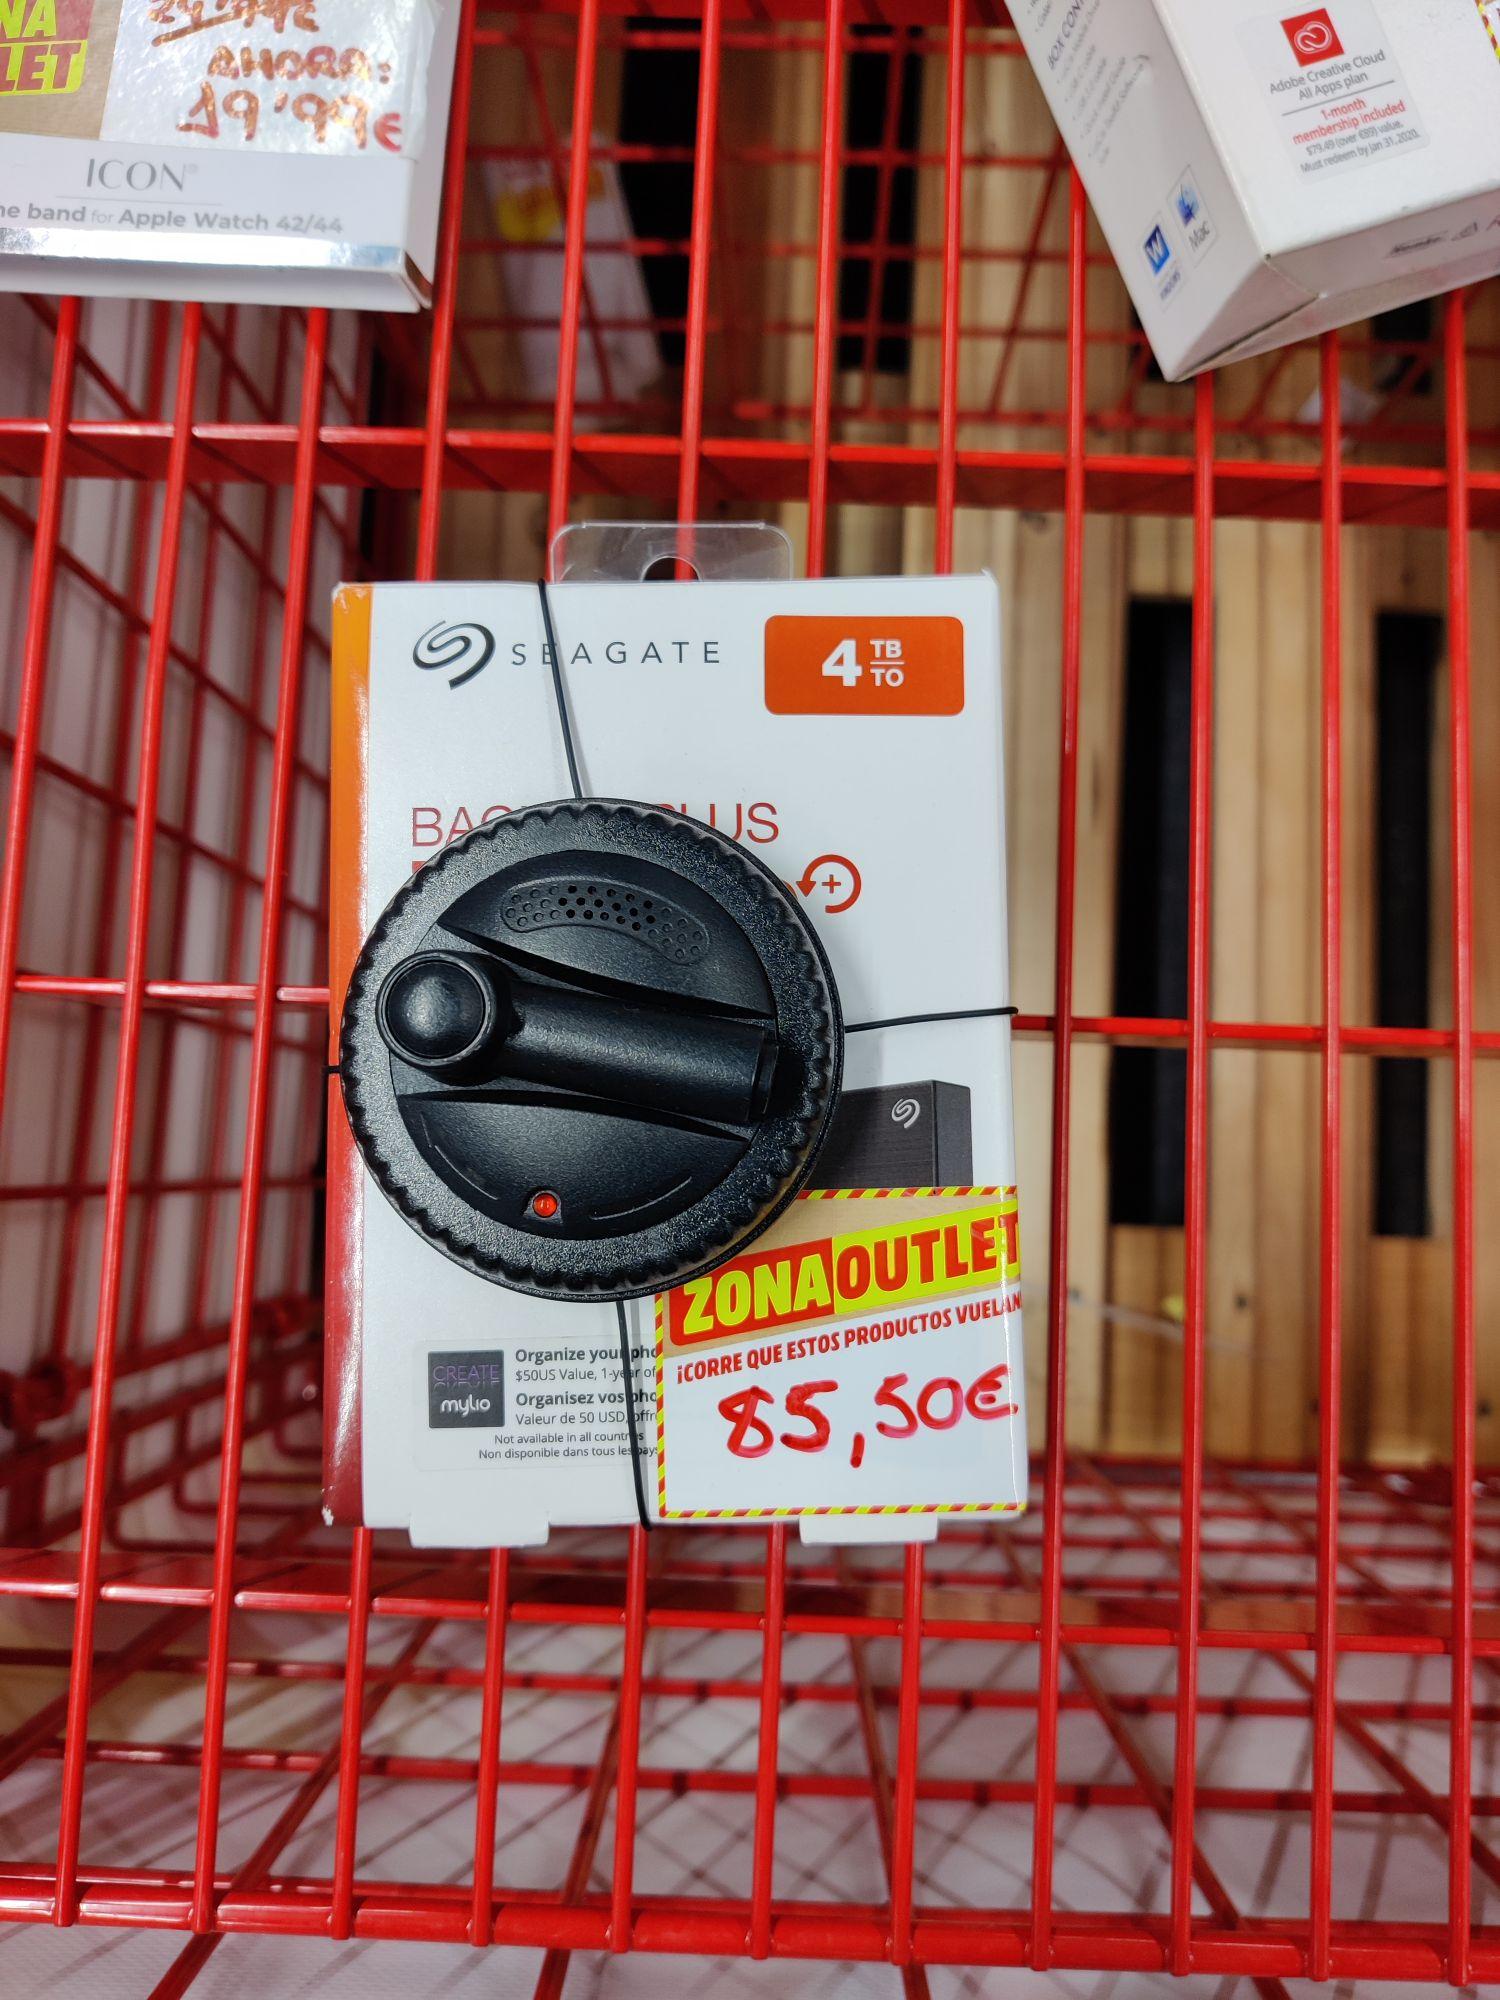 Disco Duro Seagate 4 TB Mediamark Lagoh Sevilla (Zona Outlet)